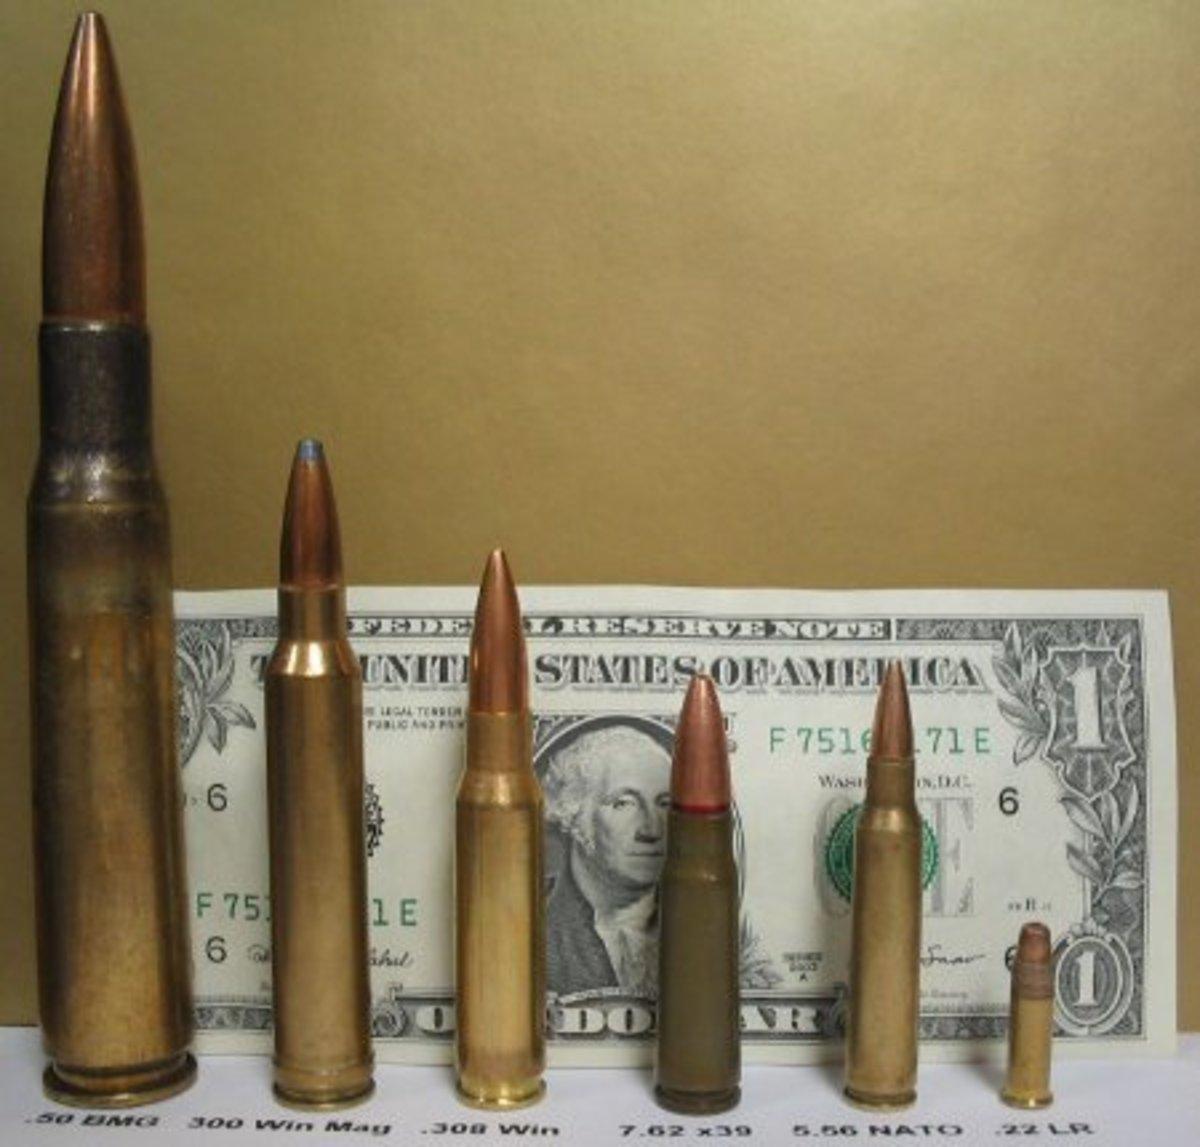 From L-R: .50 BMG, .300 Win Mag, .308 Winchester, 7.62x39mmR, 5.56x45mm, .22LR